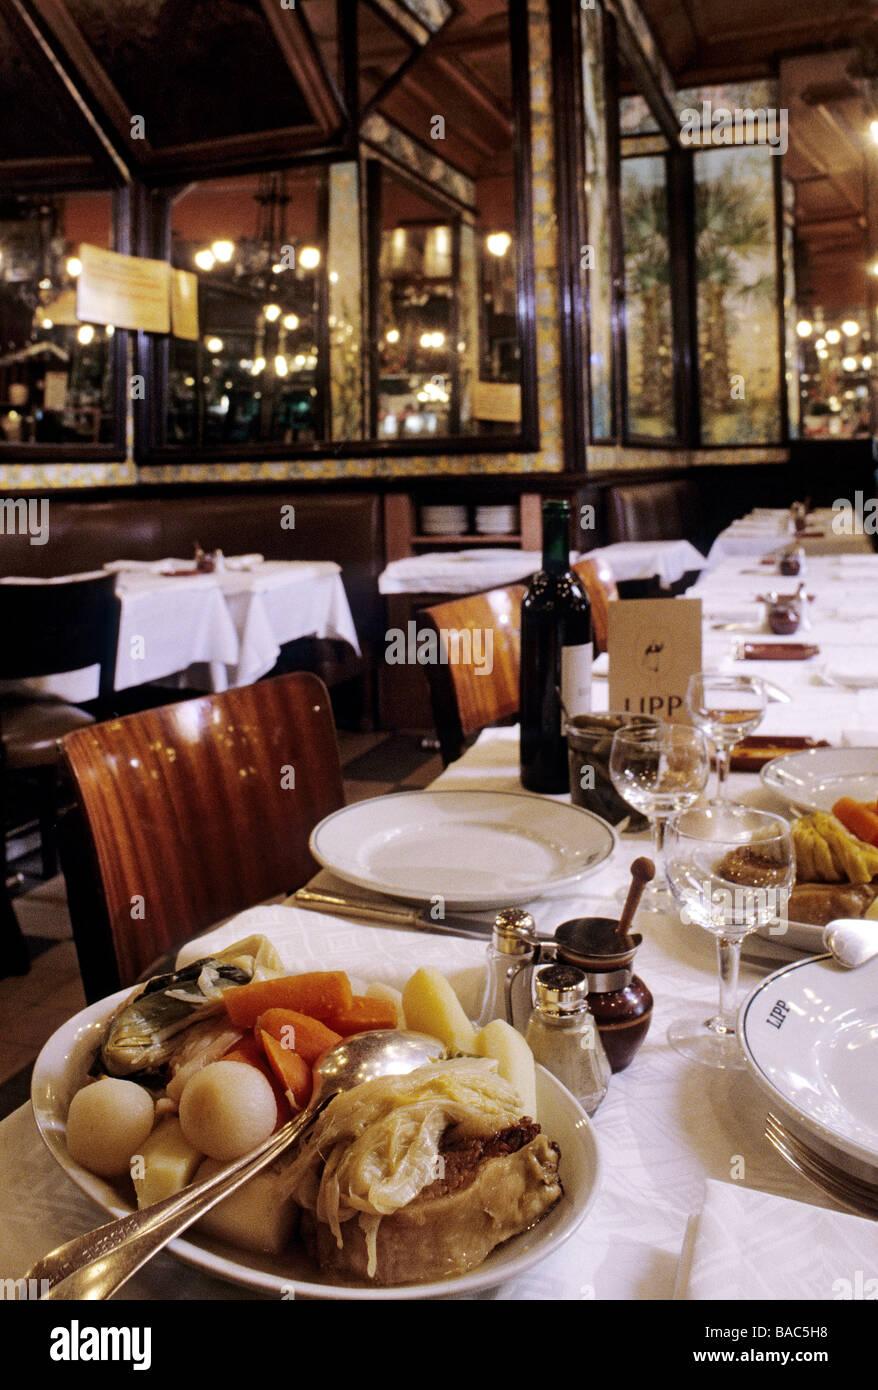 France Paris 111 Boulevard Saint Germain Lipp Restaurant Pot Au Stock Photo Alamy